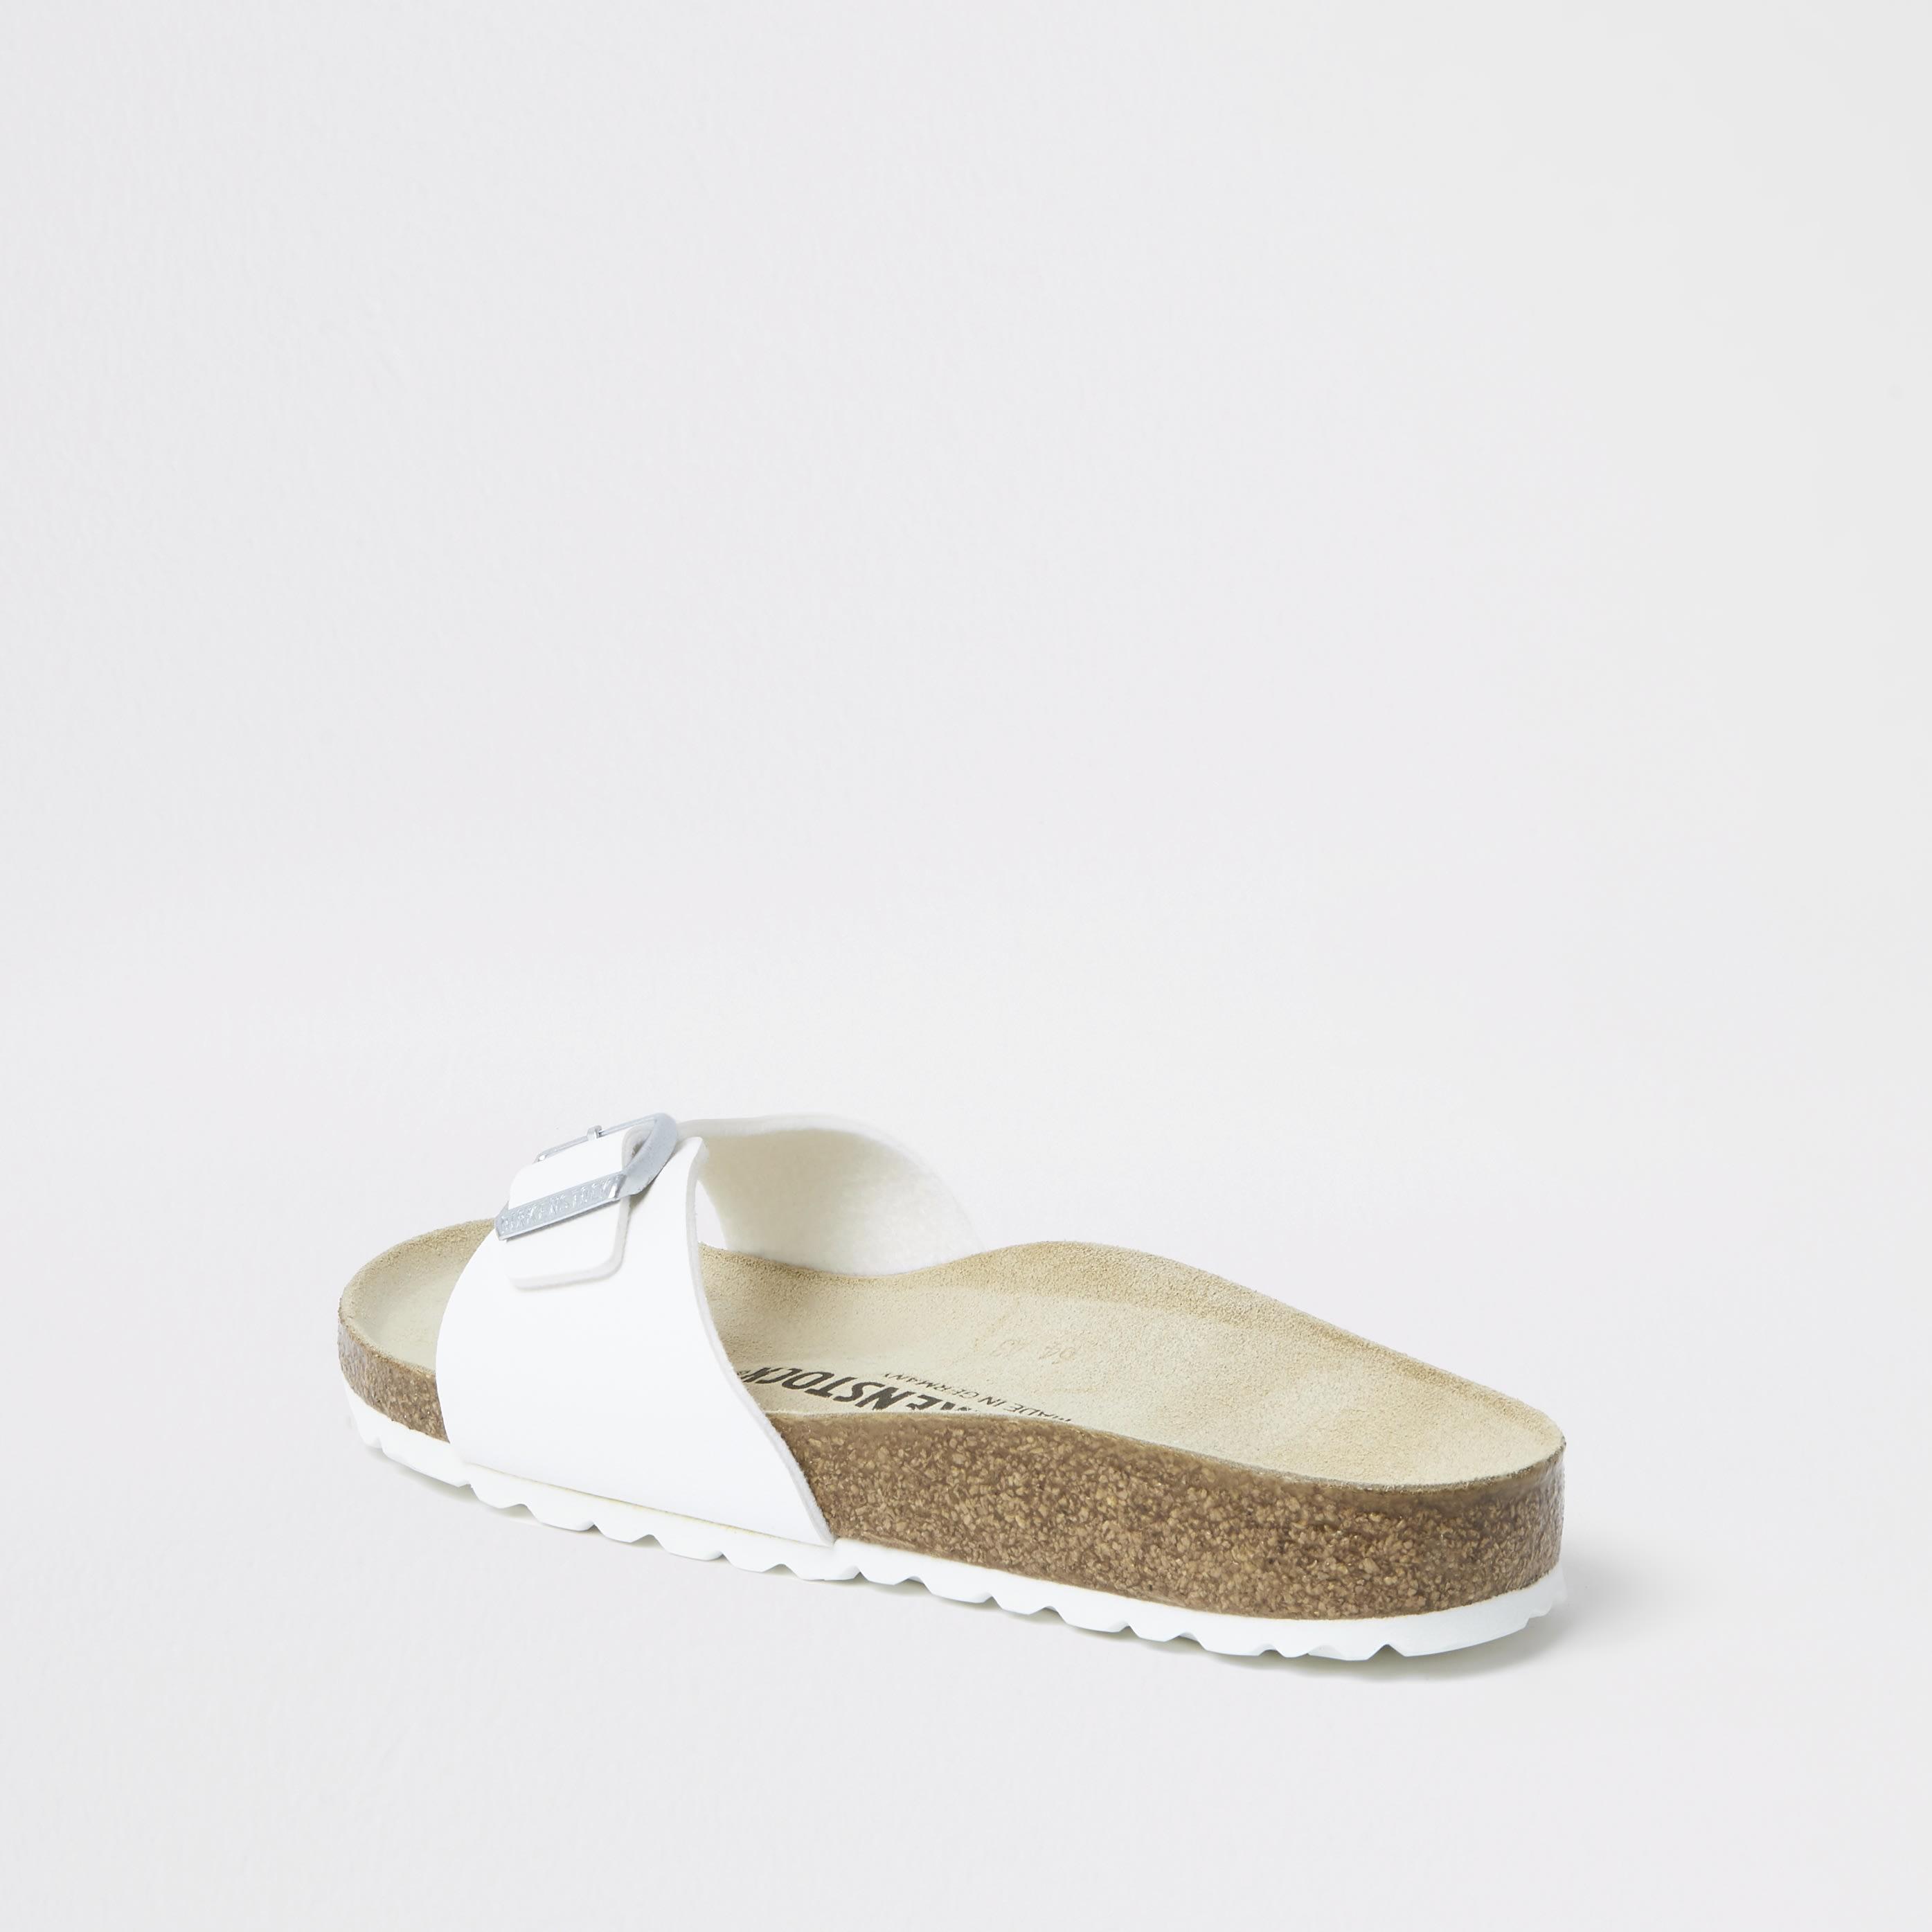 birkenstock Womens Birkenstock White Madrid sandals (7)